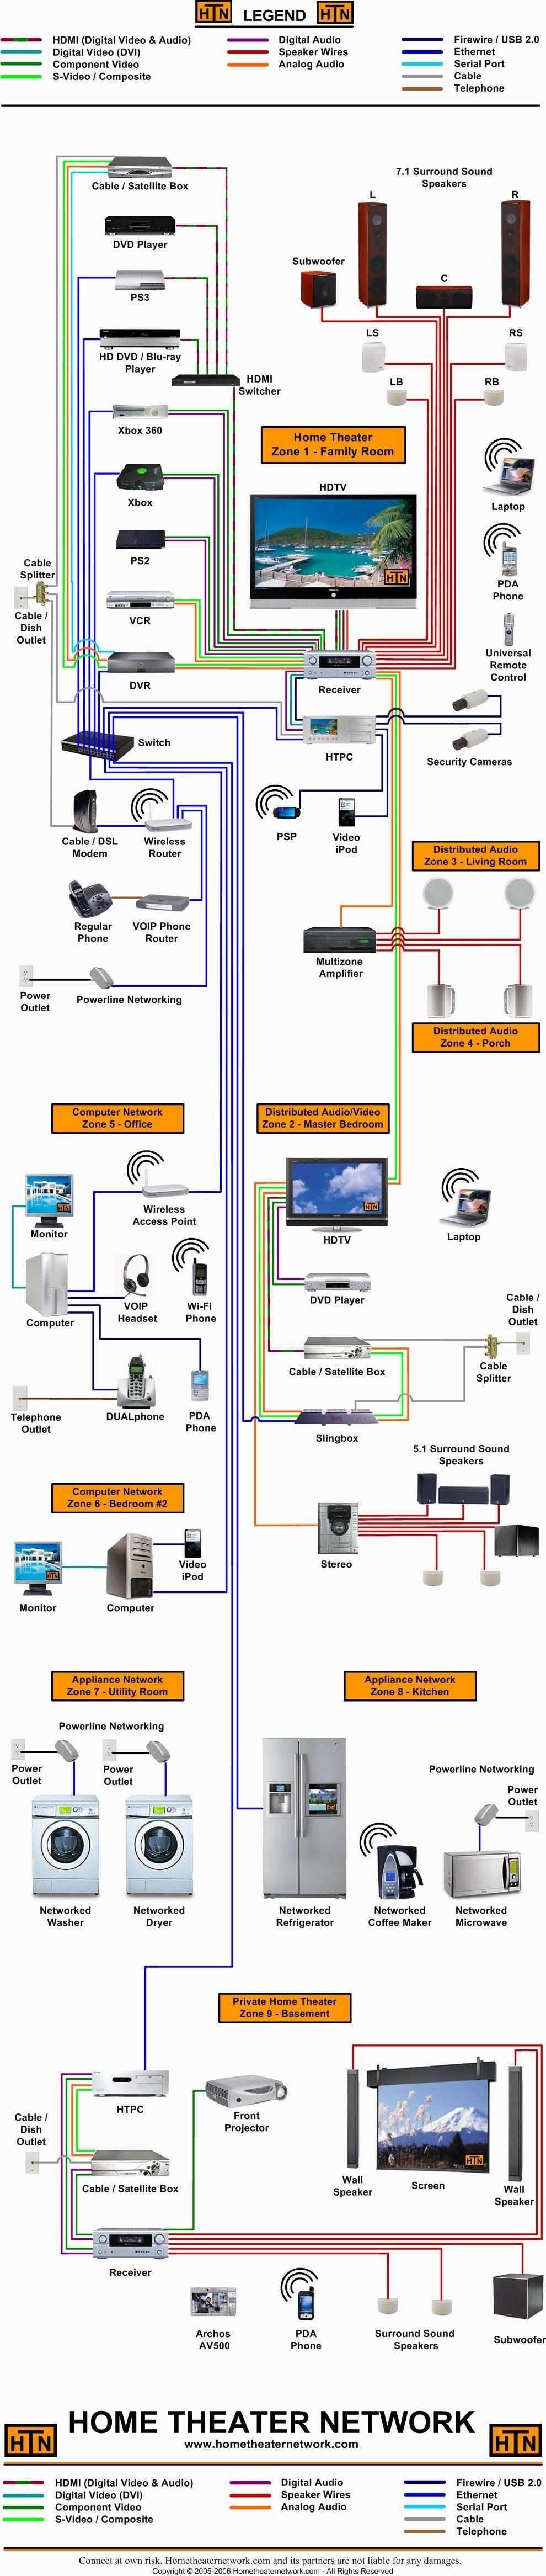 Network Wiring Diagram Luxury Nice Design Wiring Home Network Diagram